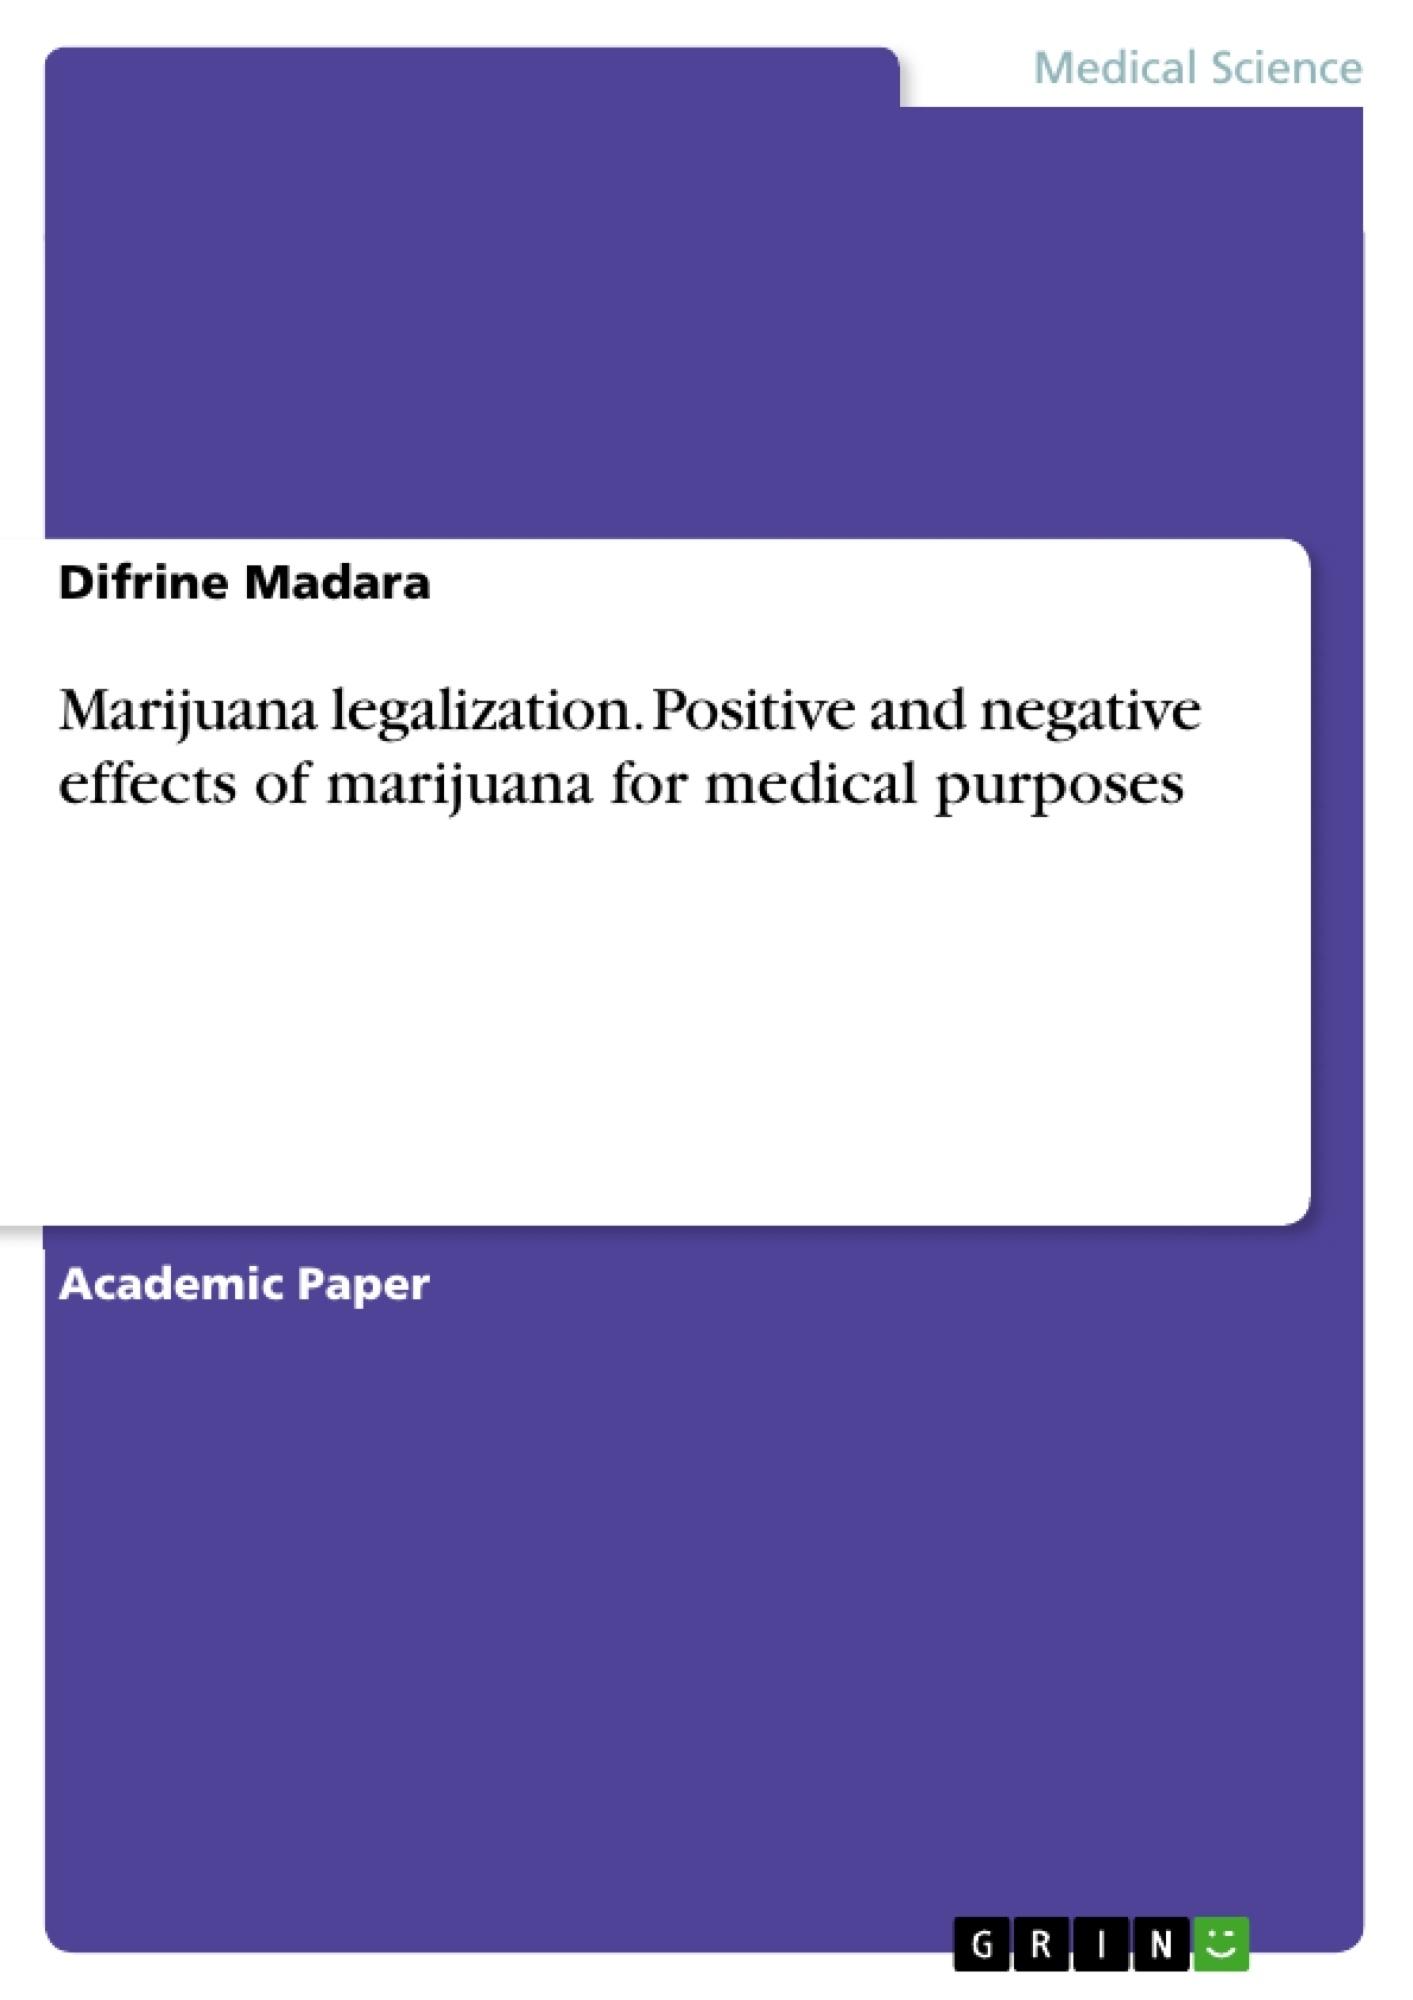 Title: Marijuana legalization. Positive and negative effects of marijuana for medical purposes